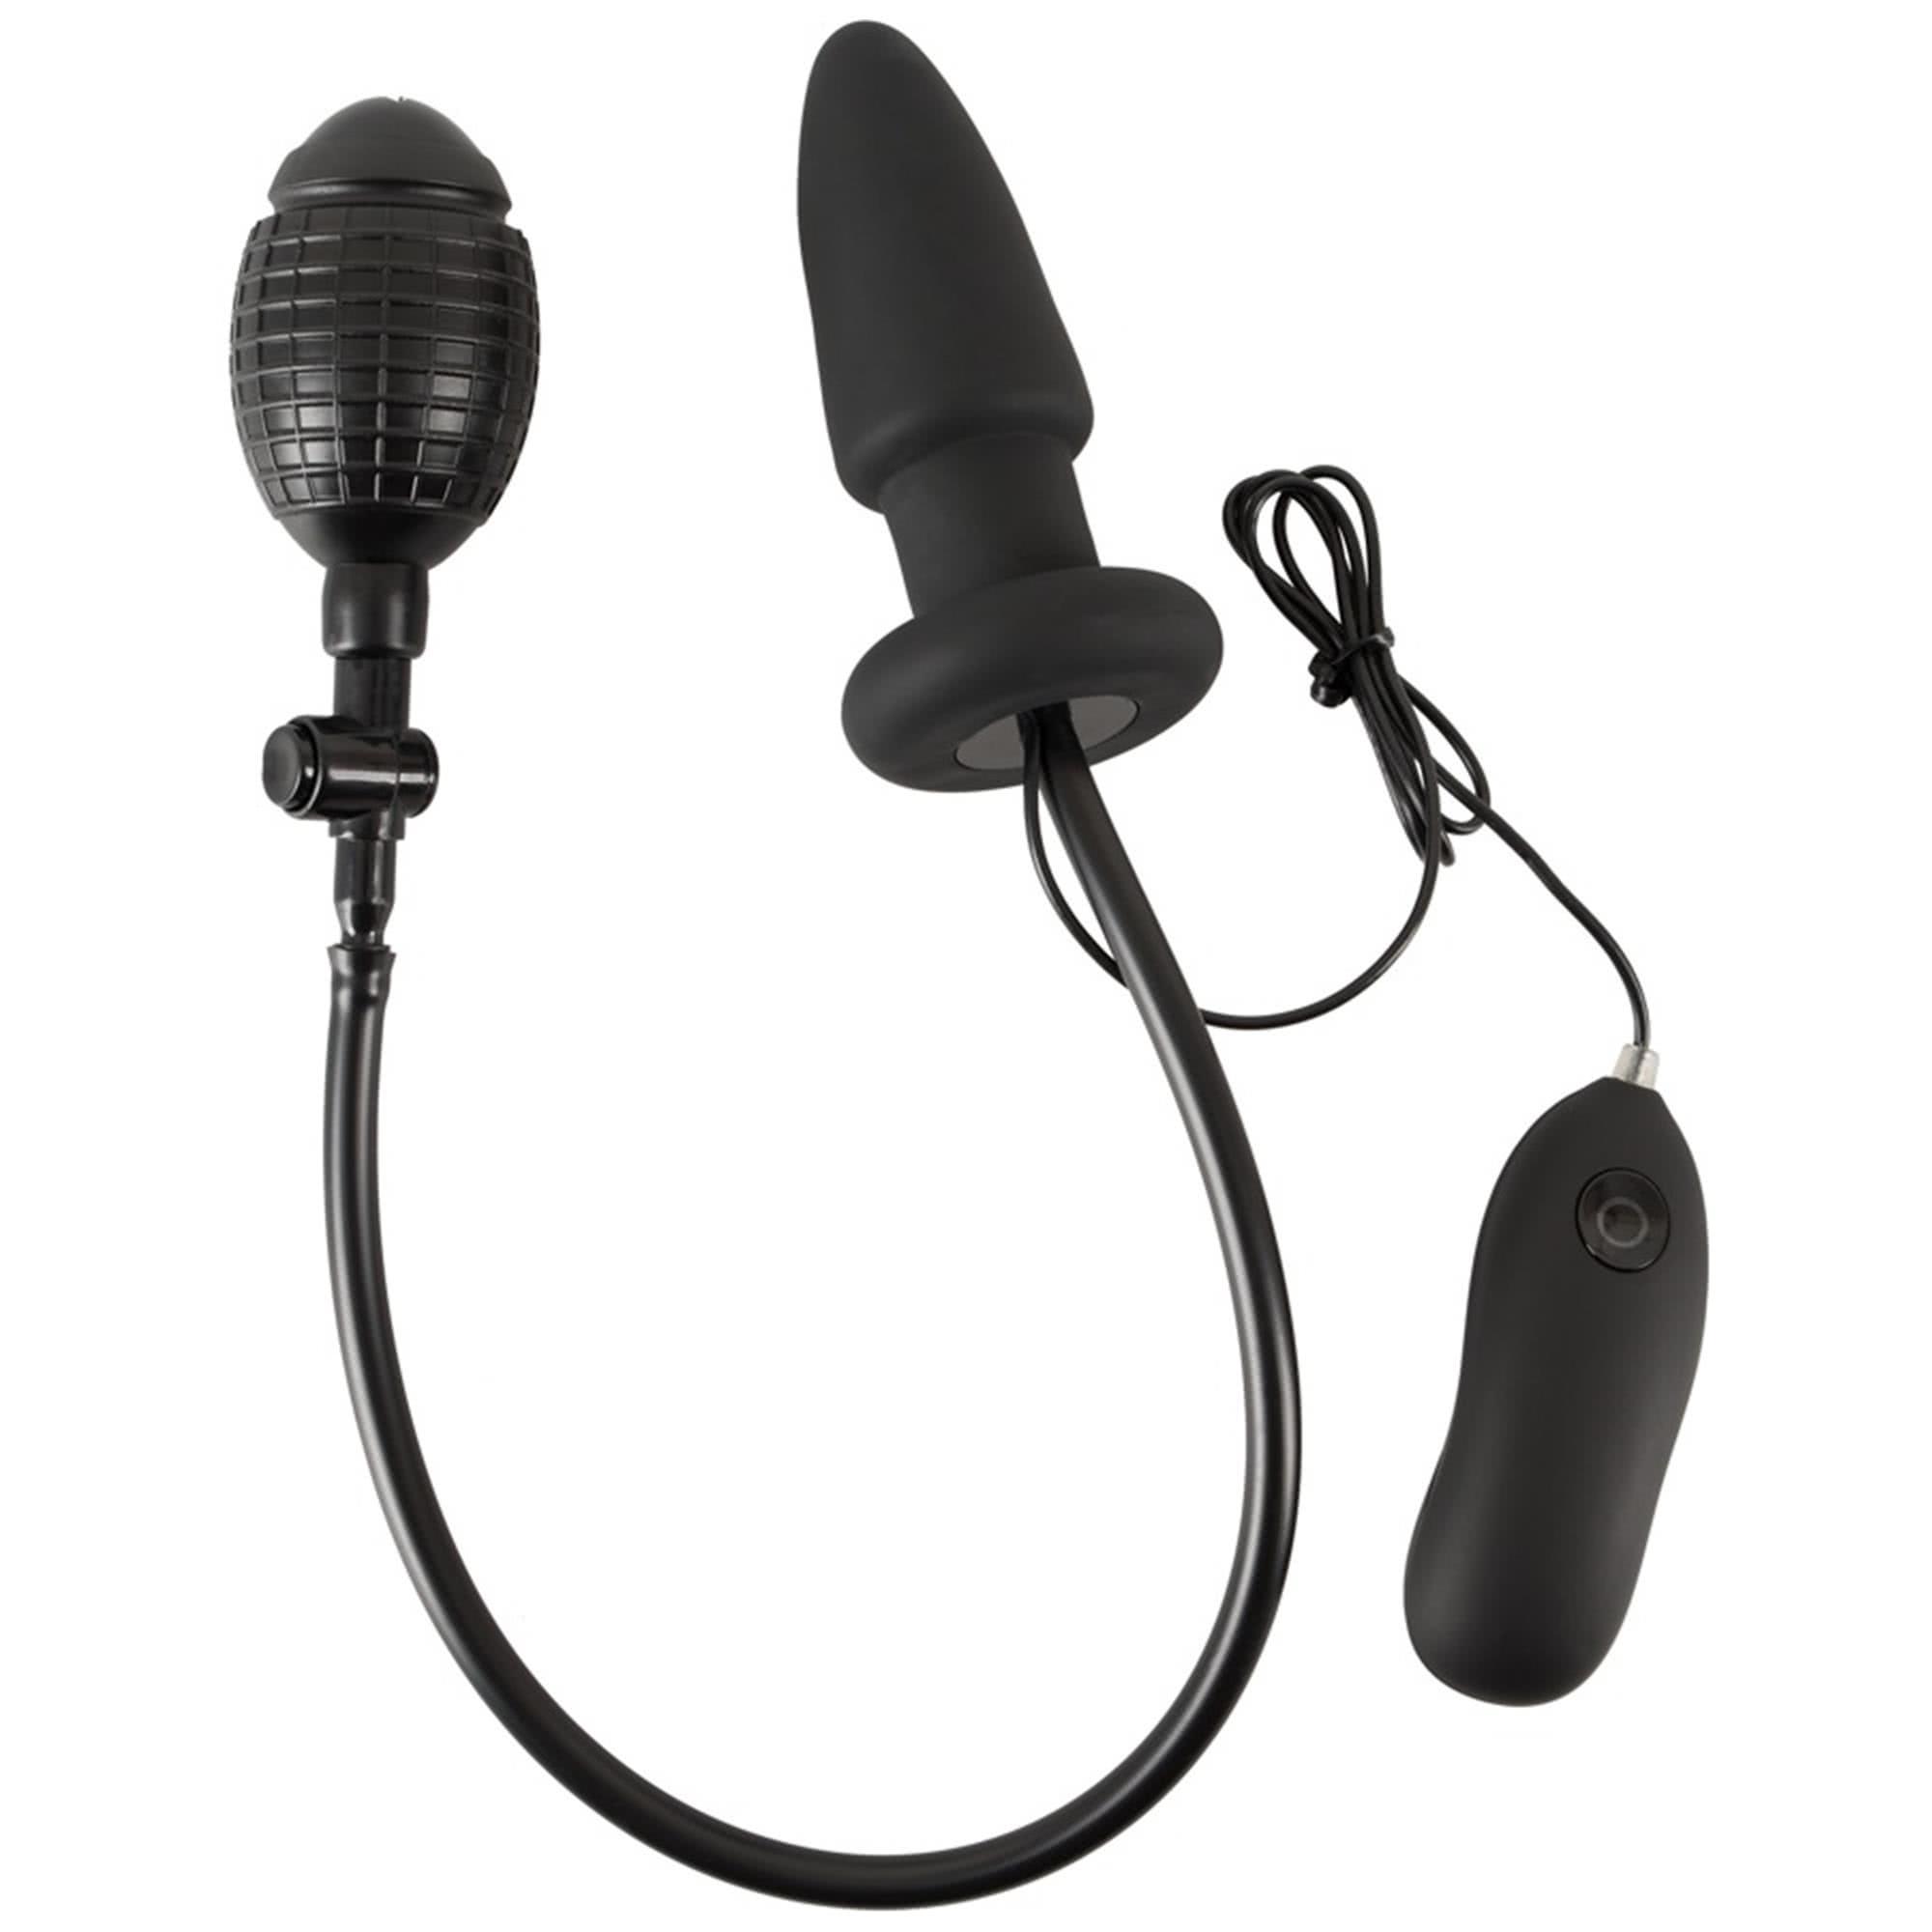 Inflatable + Vibrating Butt plug